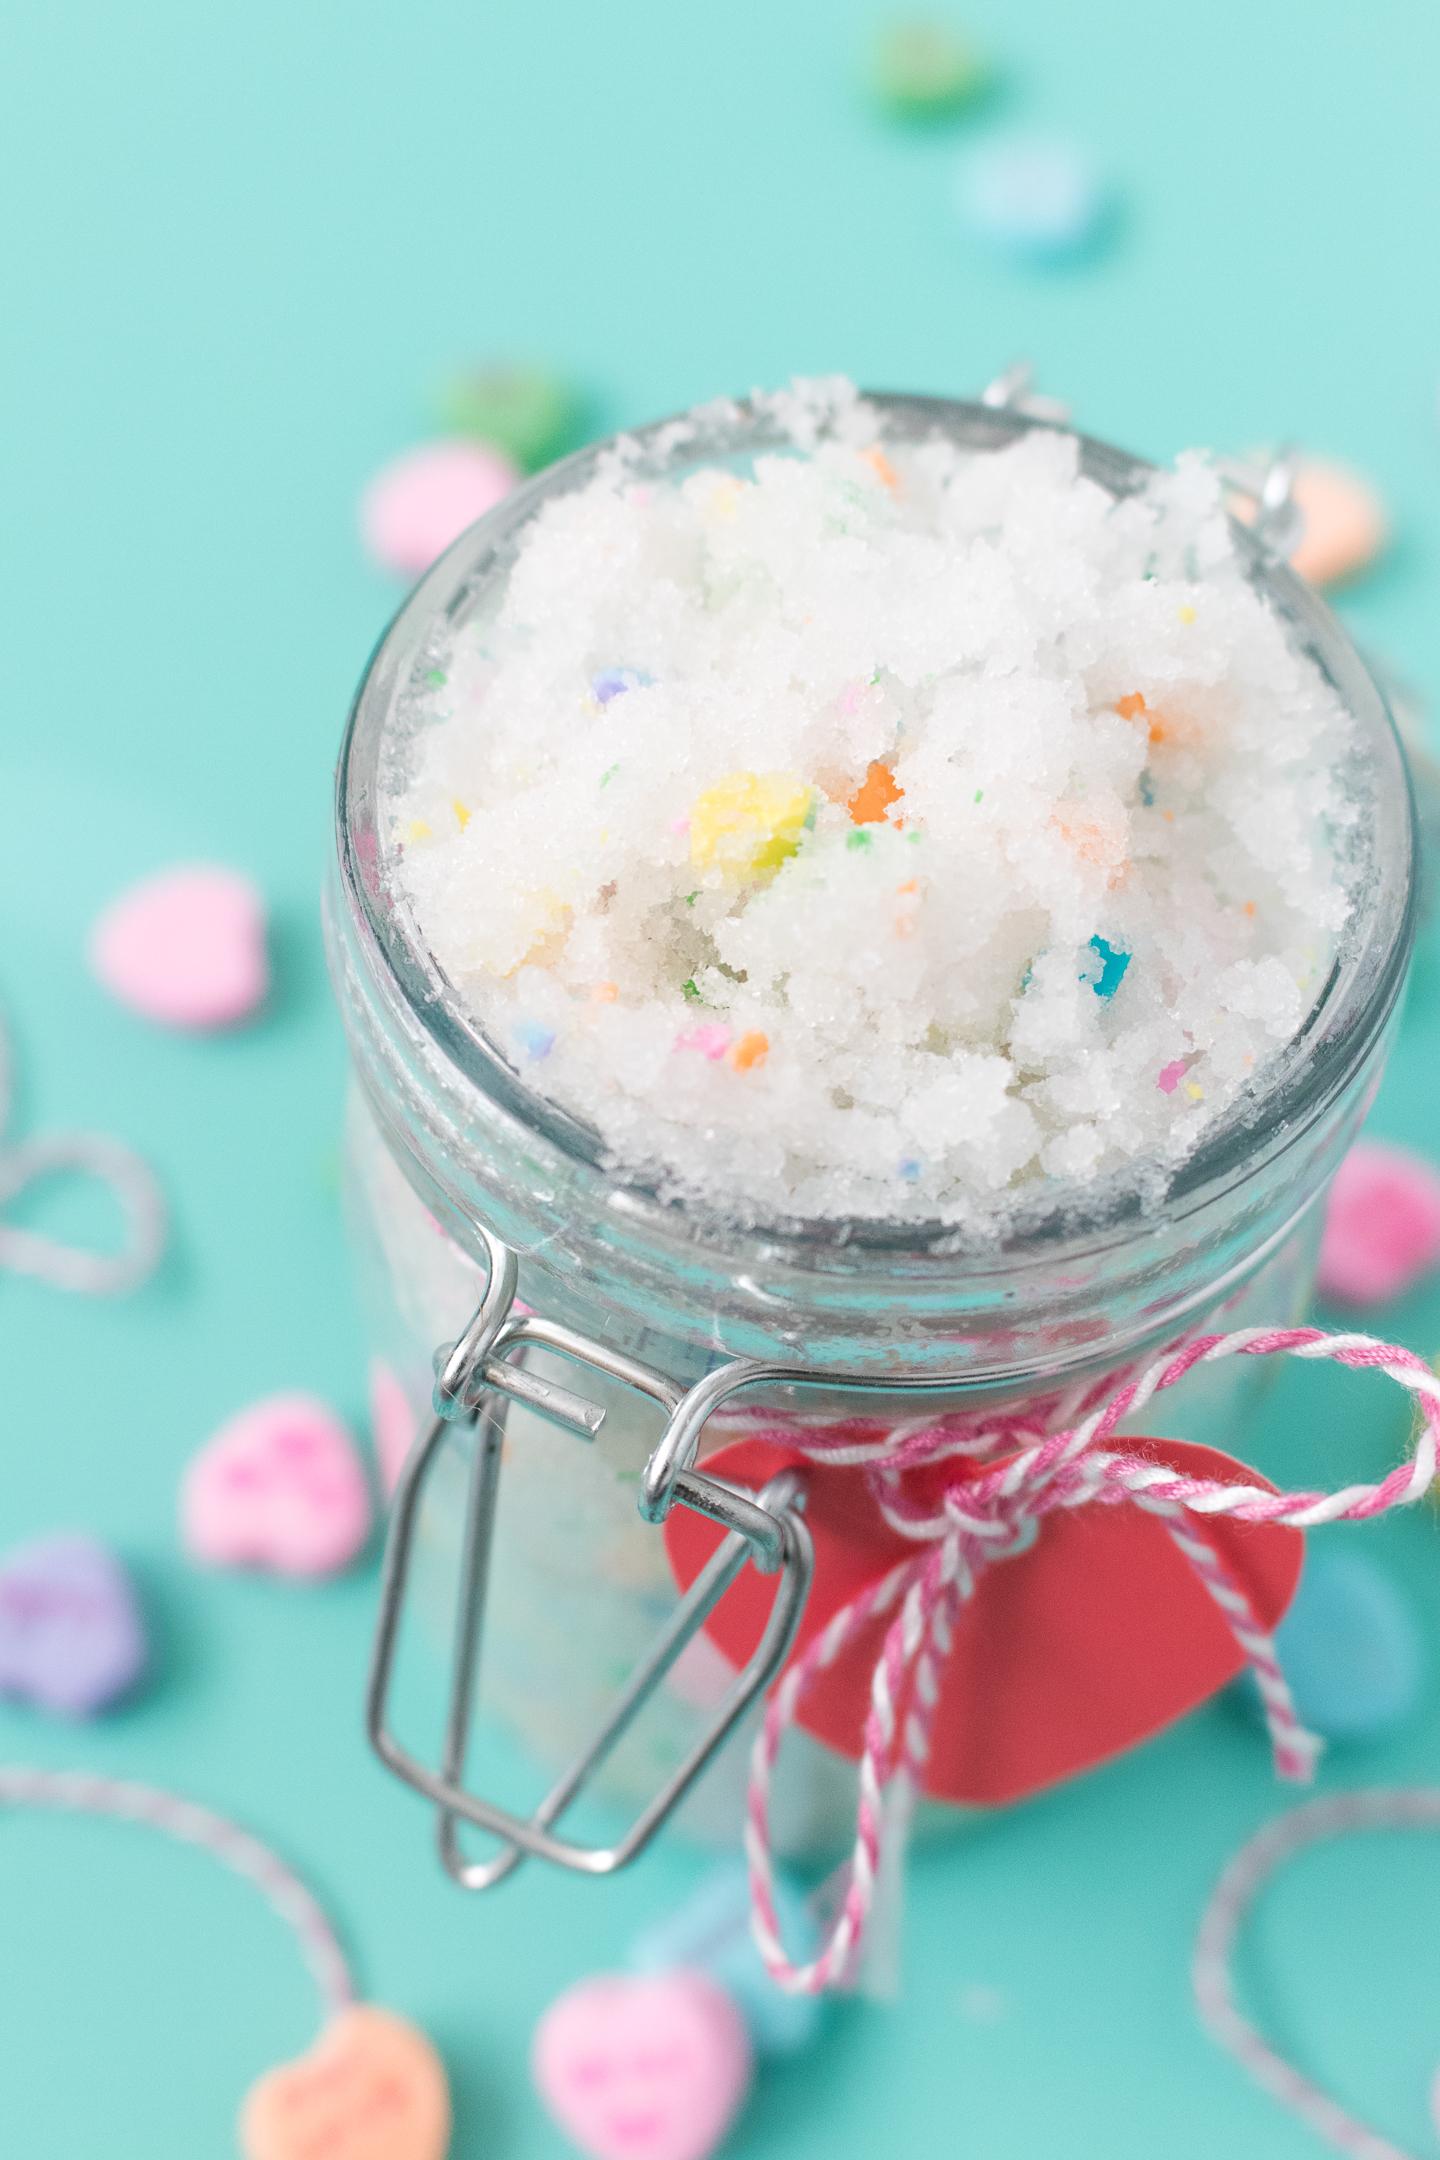 http://sarahhearts.com/wp-content/uploads/2018/01/diy-conversation-heart-sugar-scrub-1.jpg